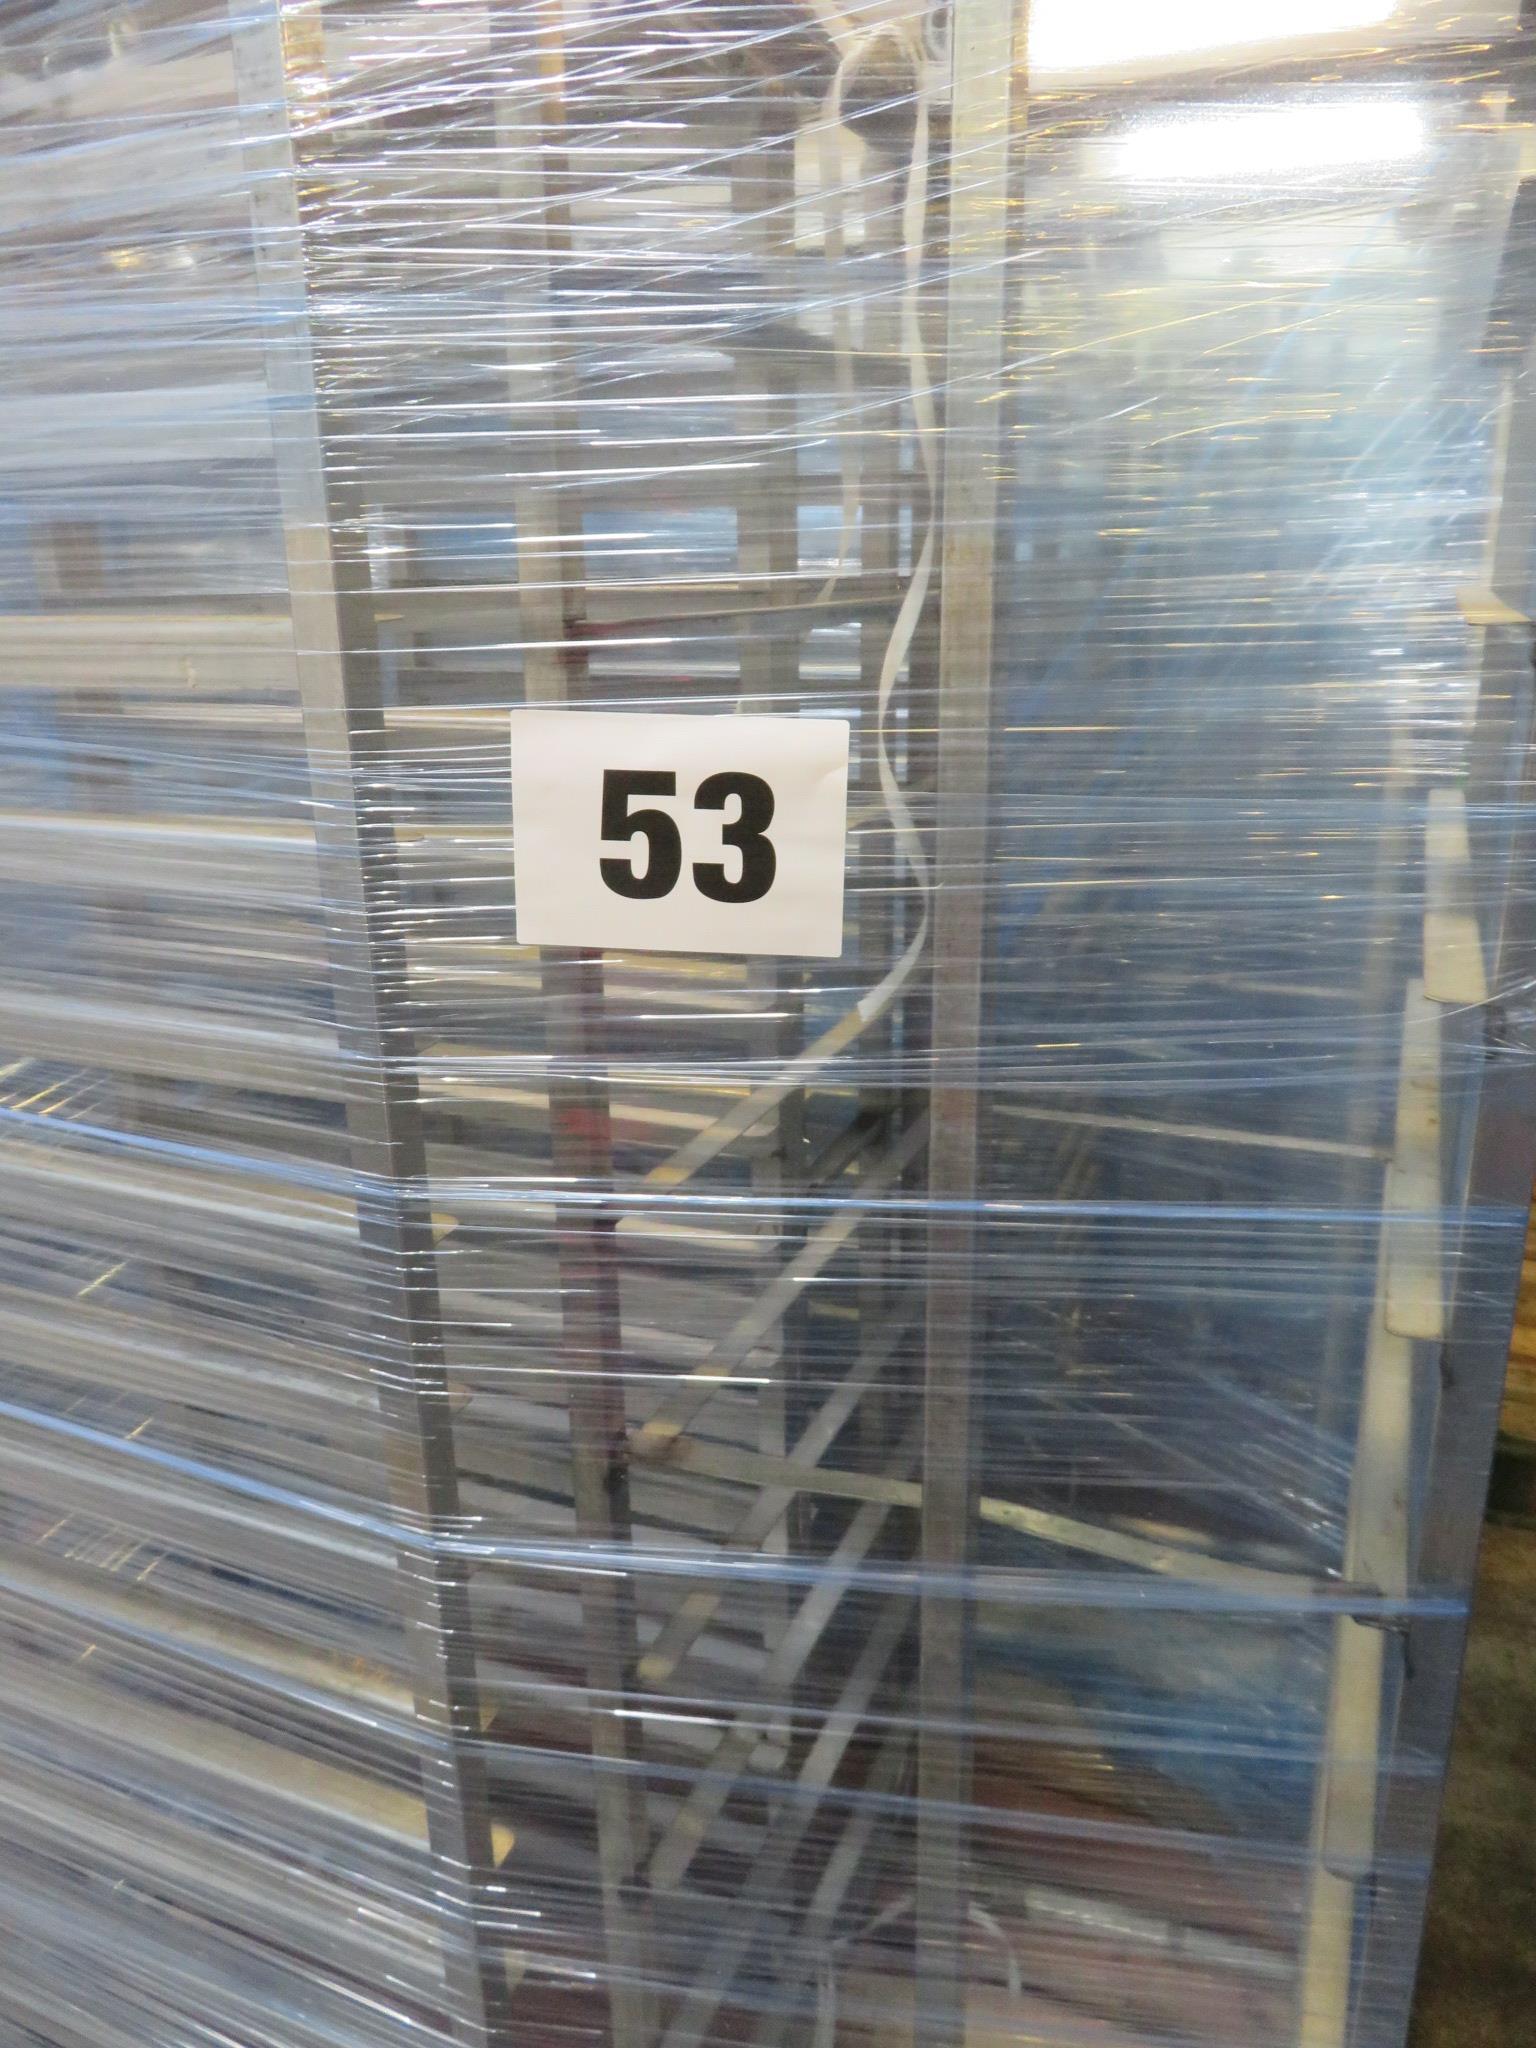 Lot 53 - 3 x S/s Racks:-2 x S/s Racks capable of taking 16 trays.Approx.430 x 650 x 1800mm high. LO£20